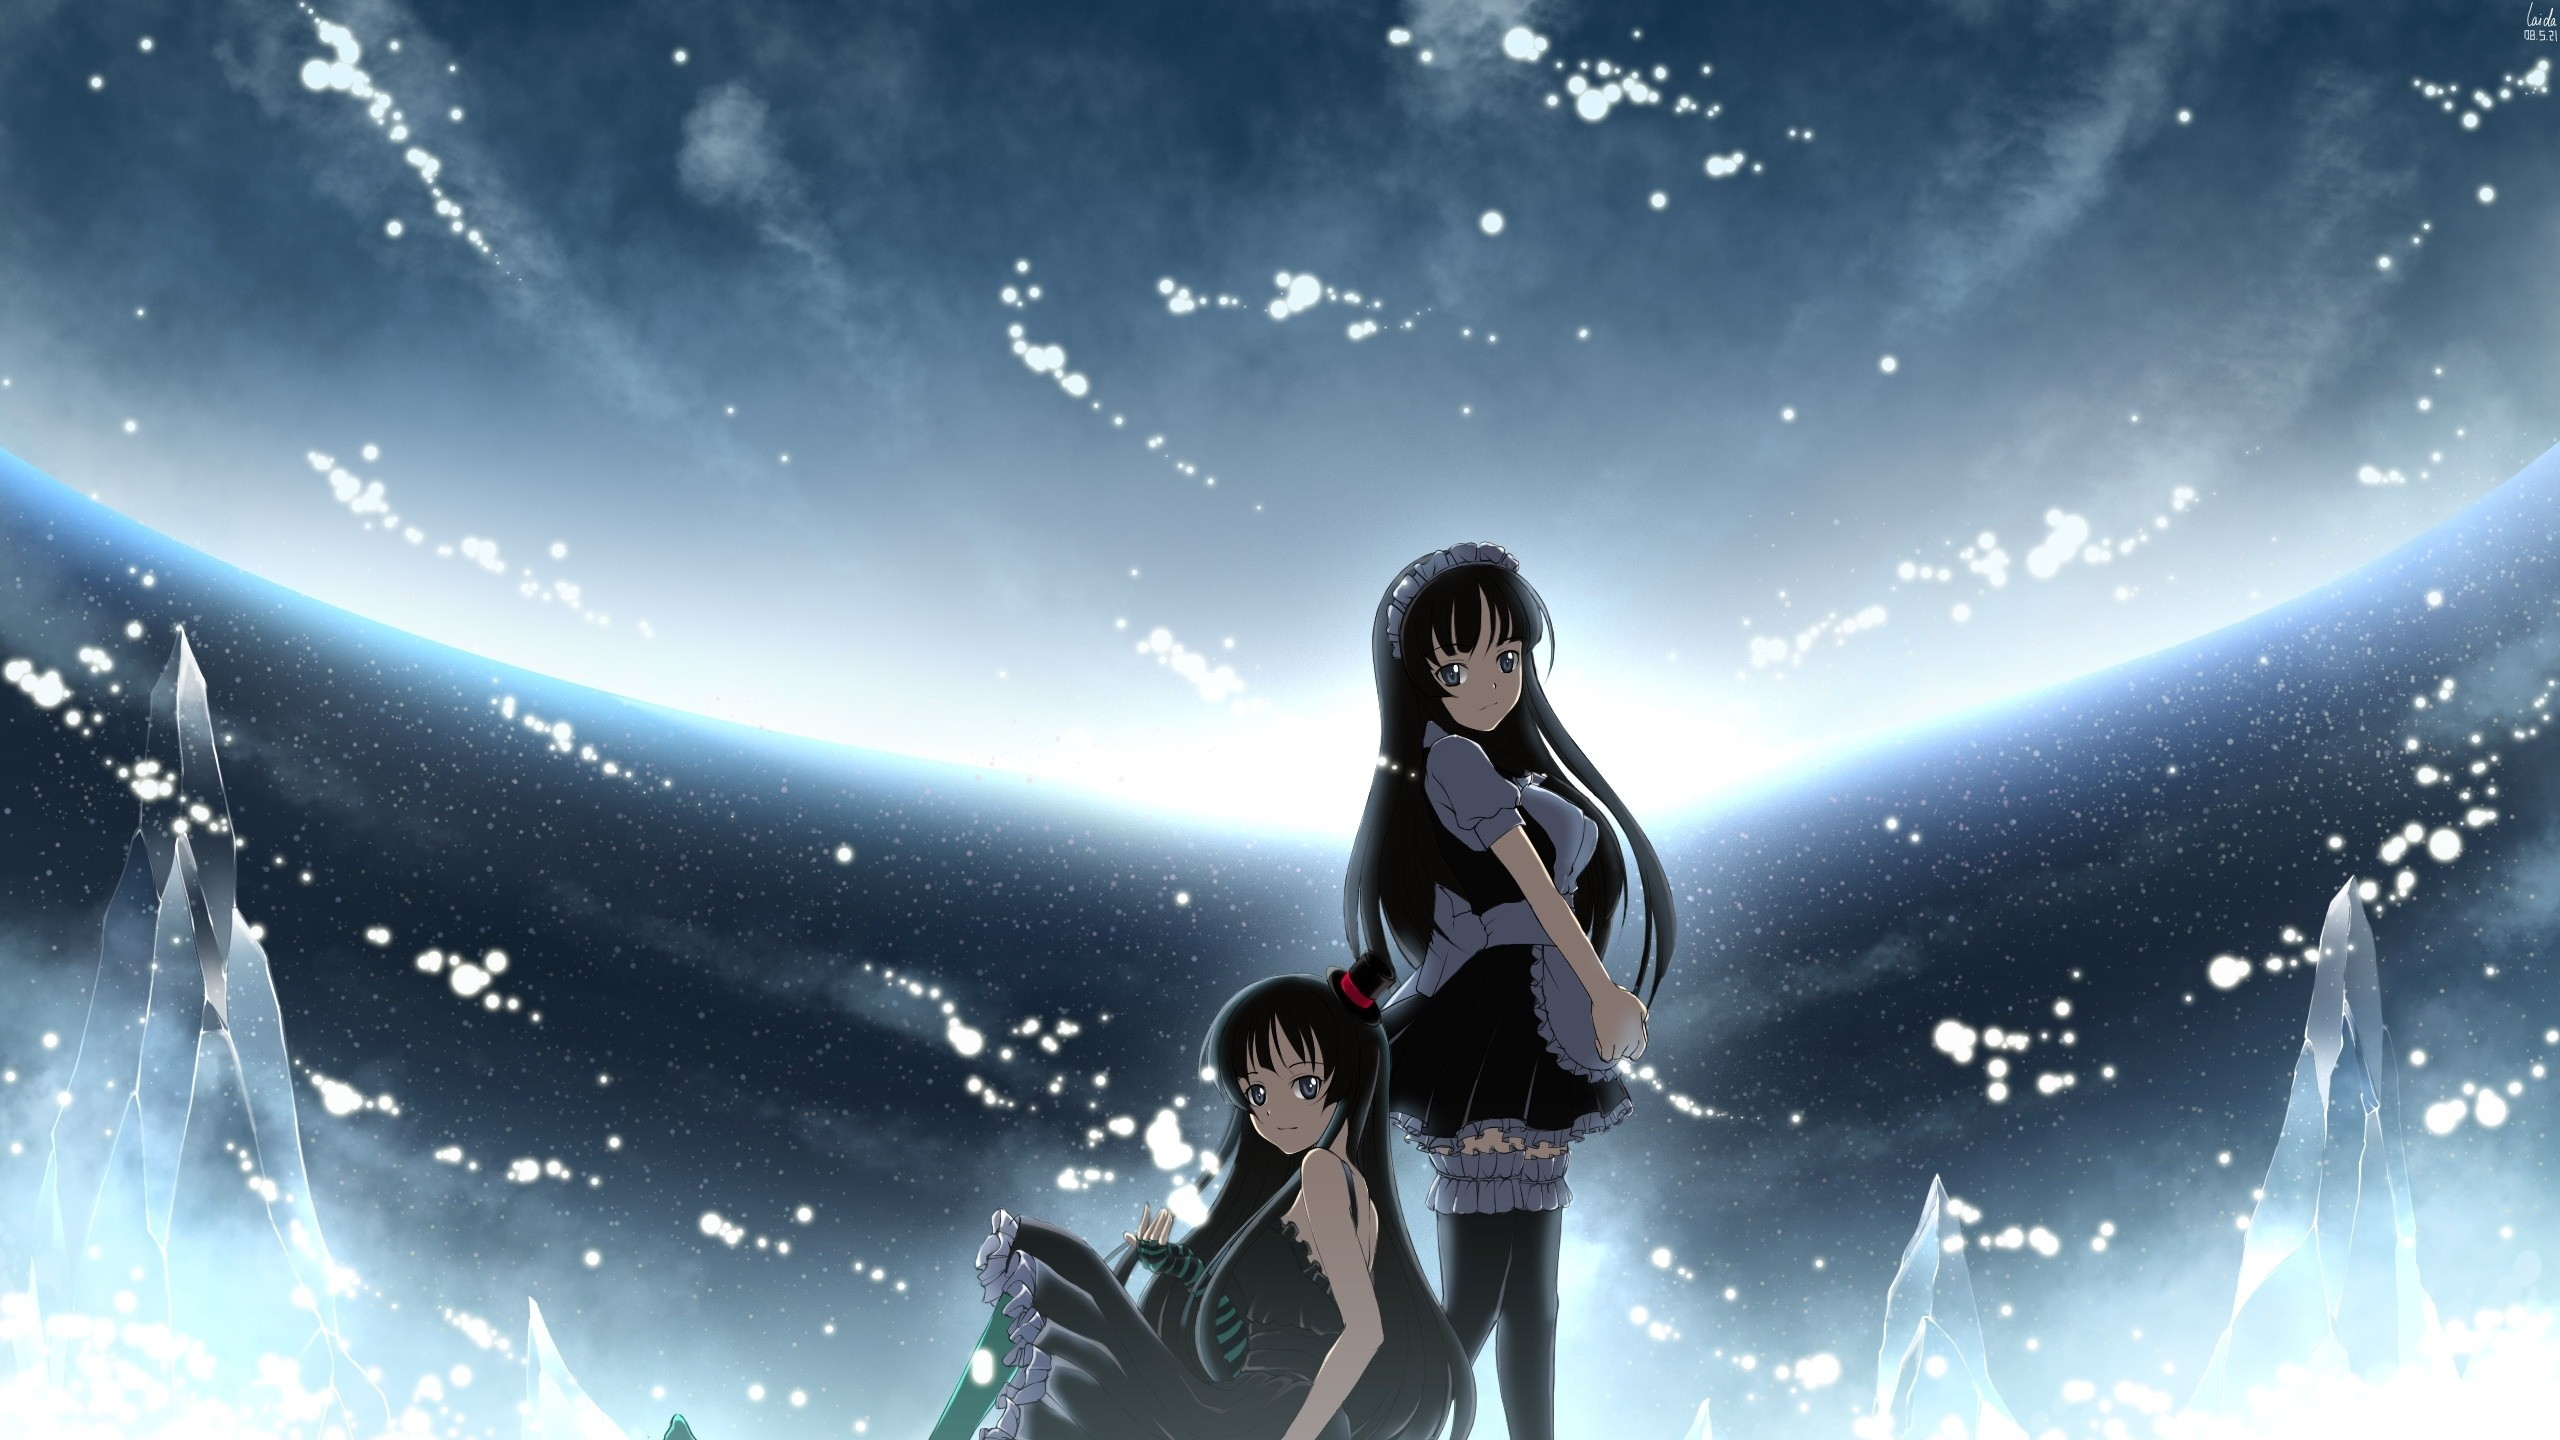 Wallpaper anime, brunette, ice, snow, space